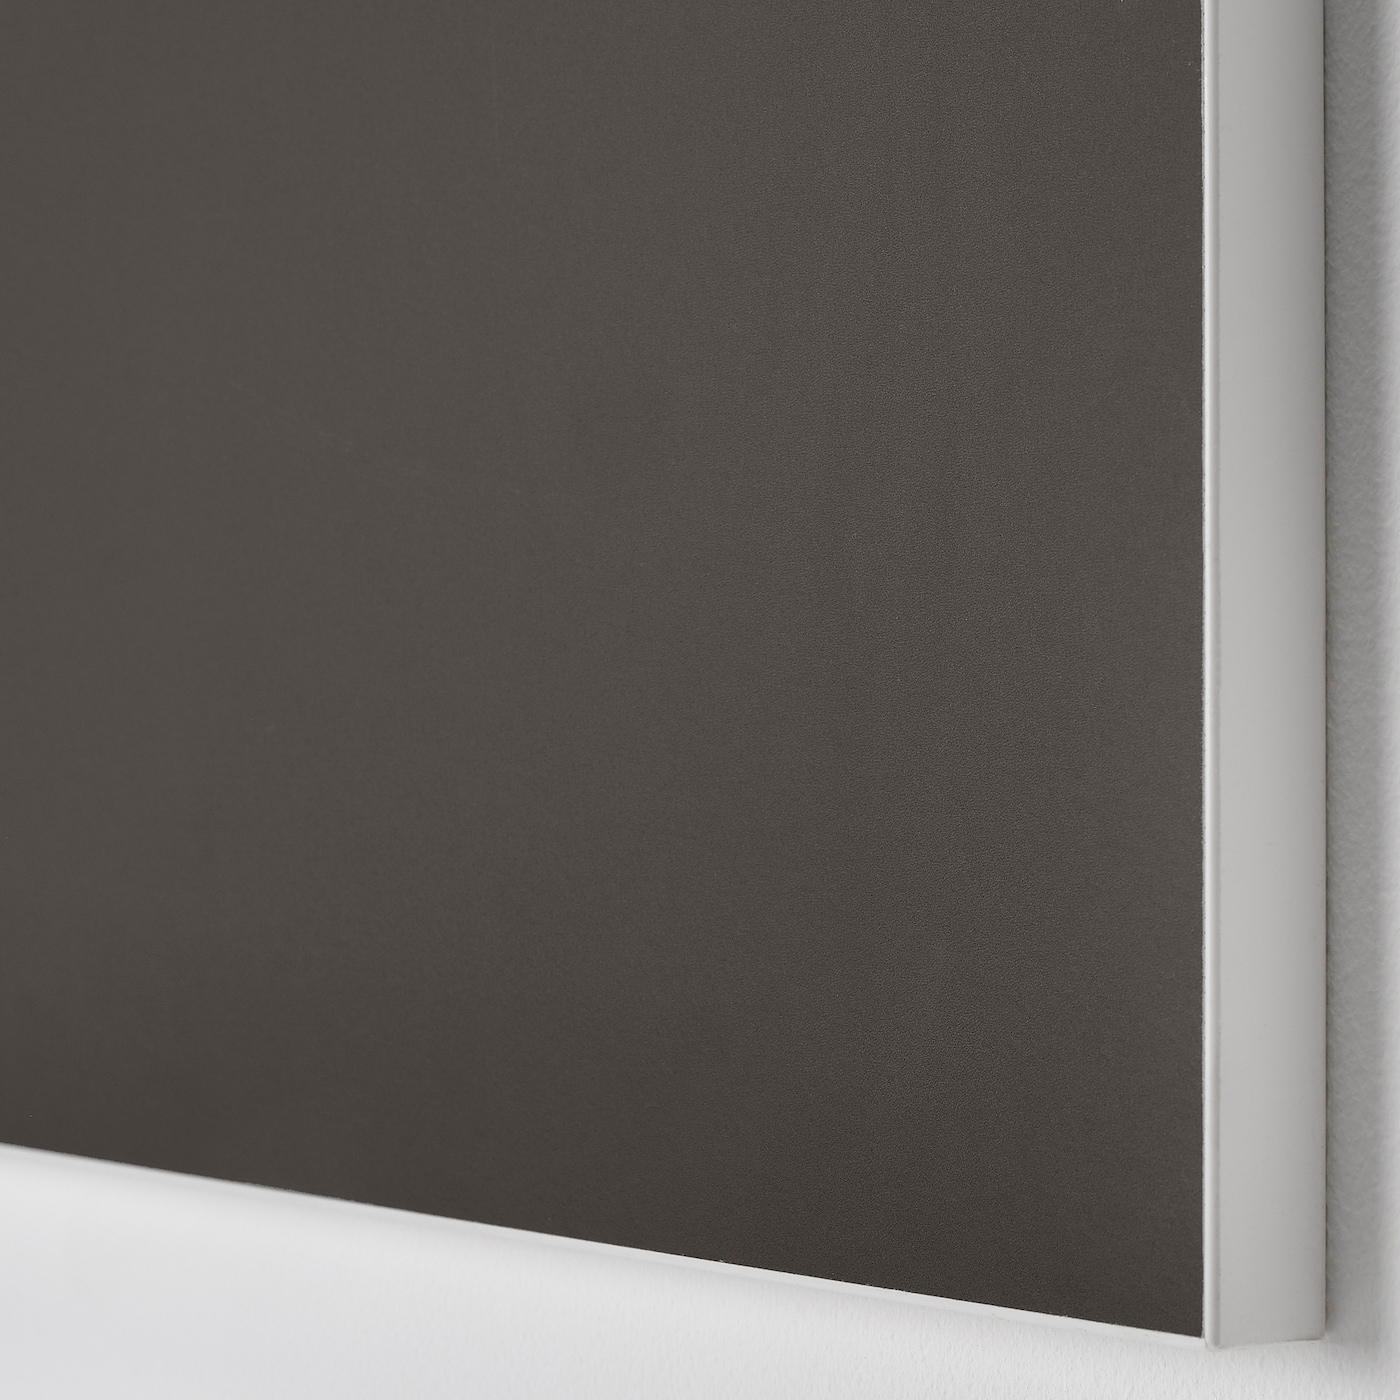 SKATVAL Drawer, white/dark grey, 80x42x20 cm